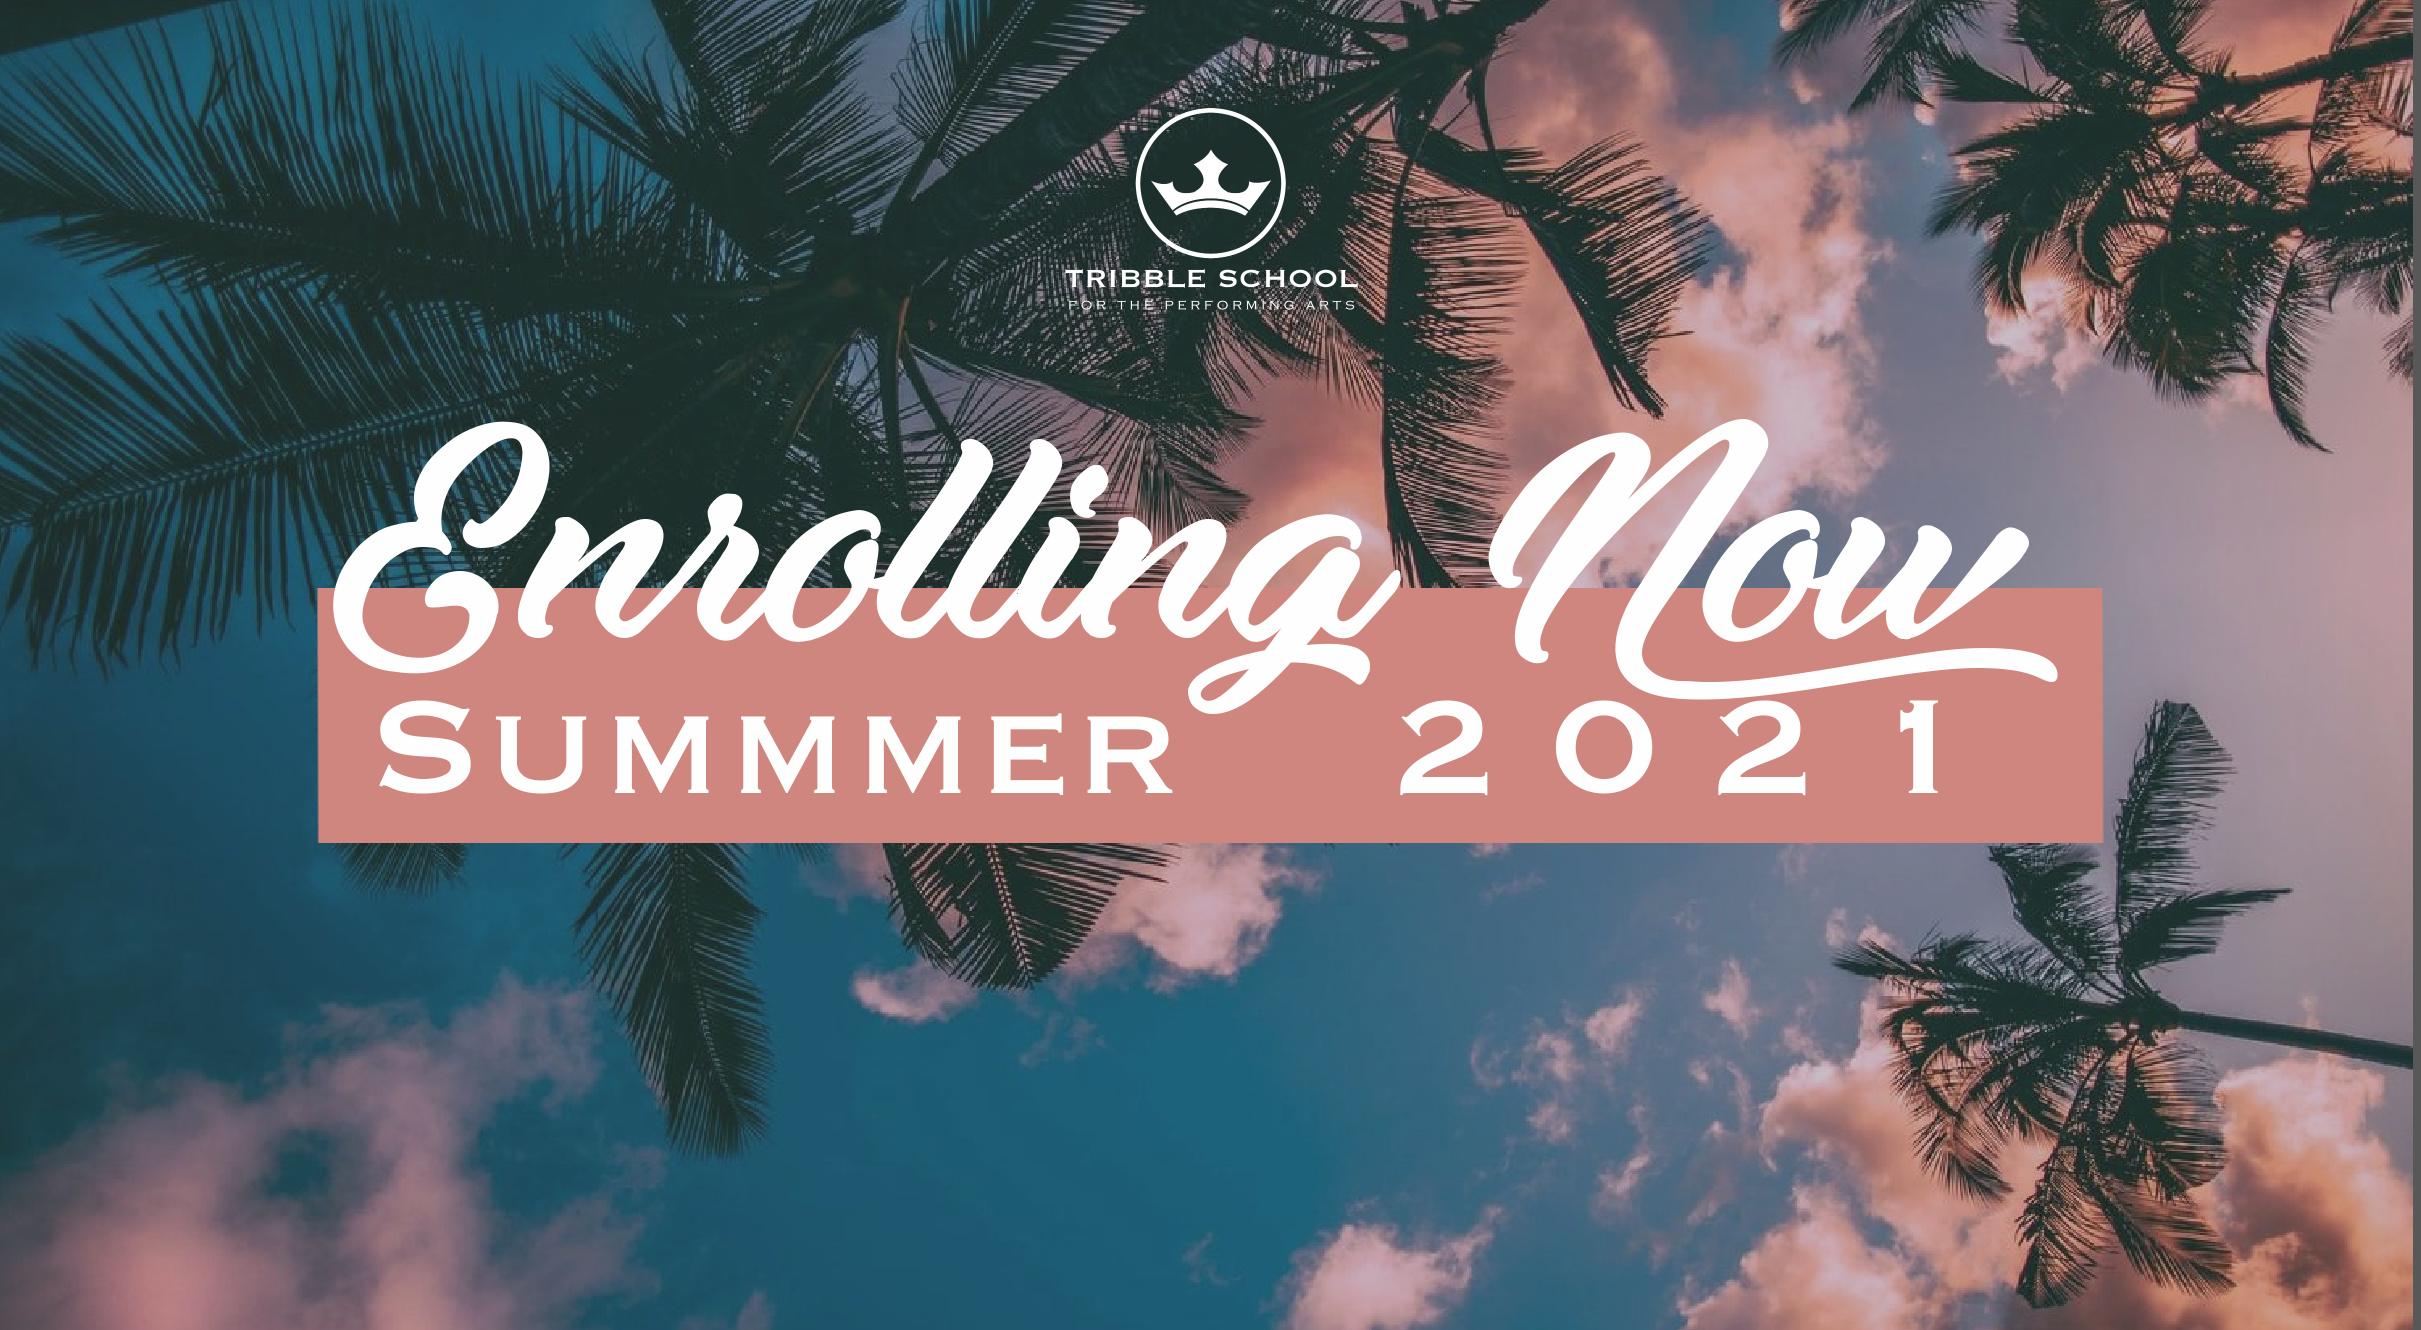 Enrolling now Summer 2021